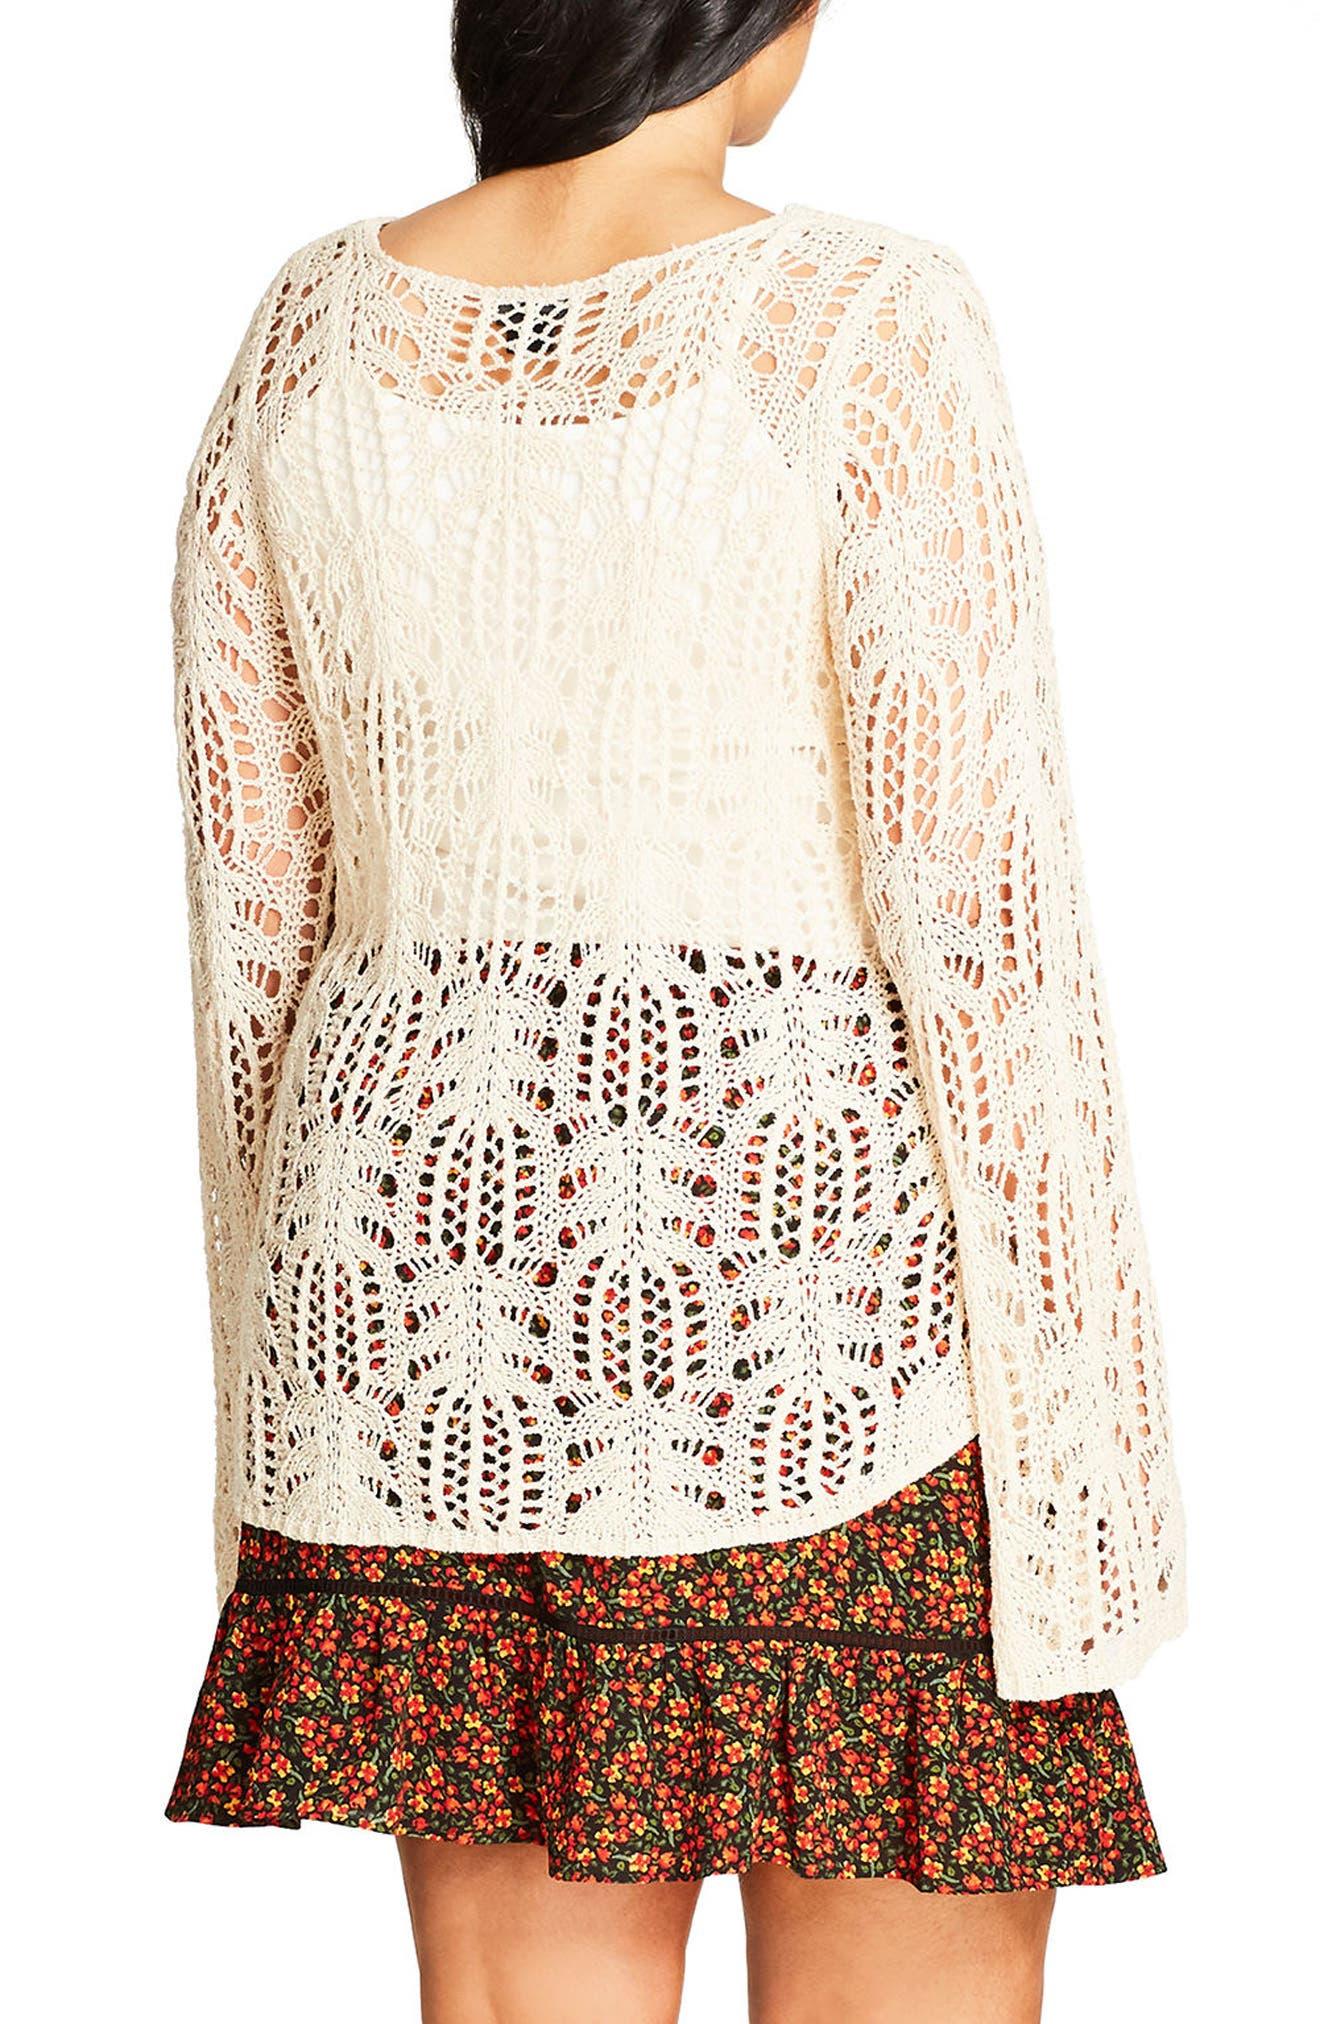 So Delicate Crochet Sweater,                             Alternate thumbnail 2, color,                             230